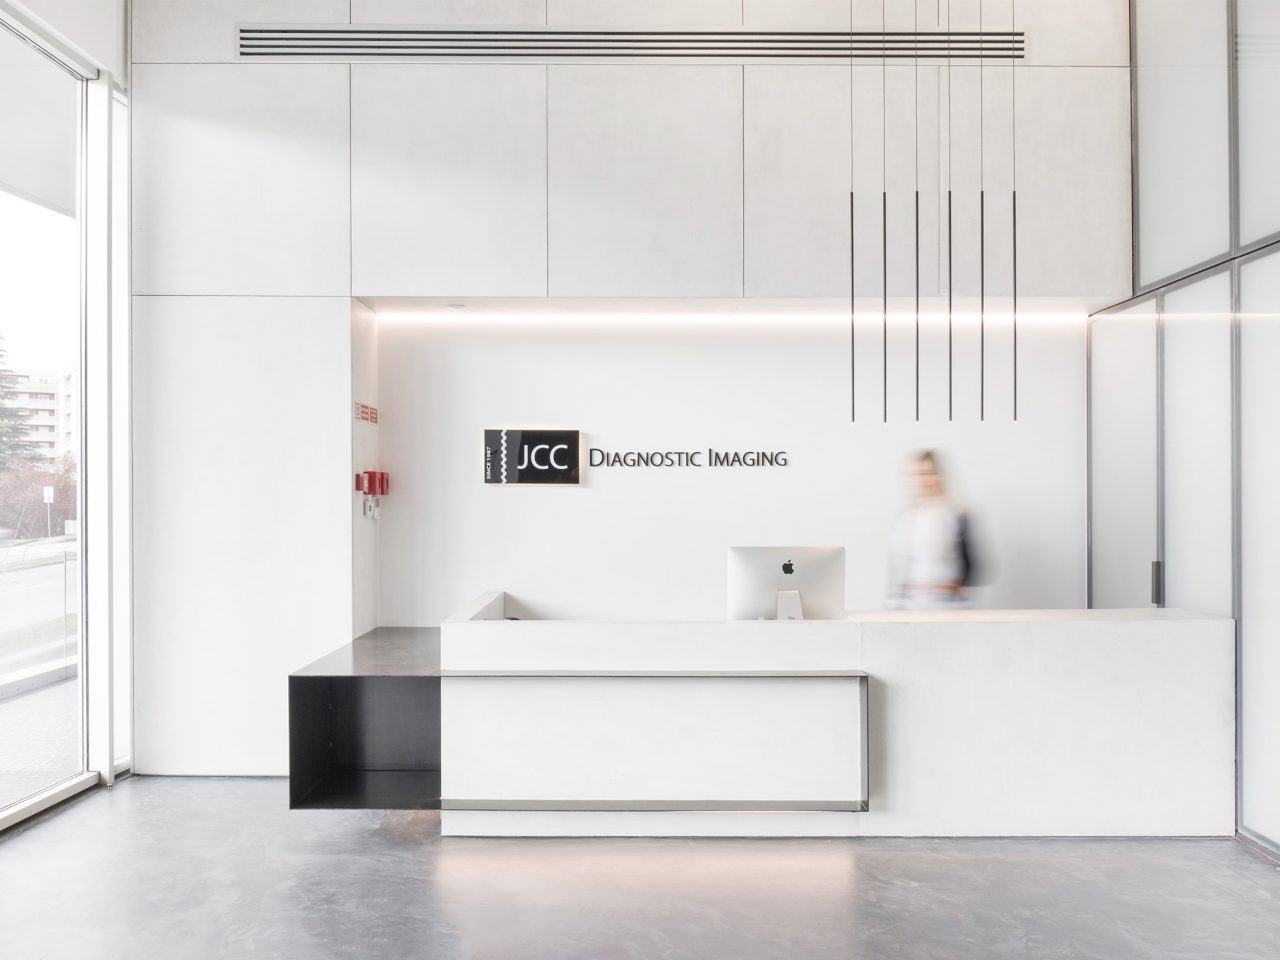 Jcc Diagnostic Imaging